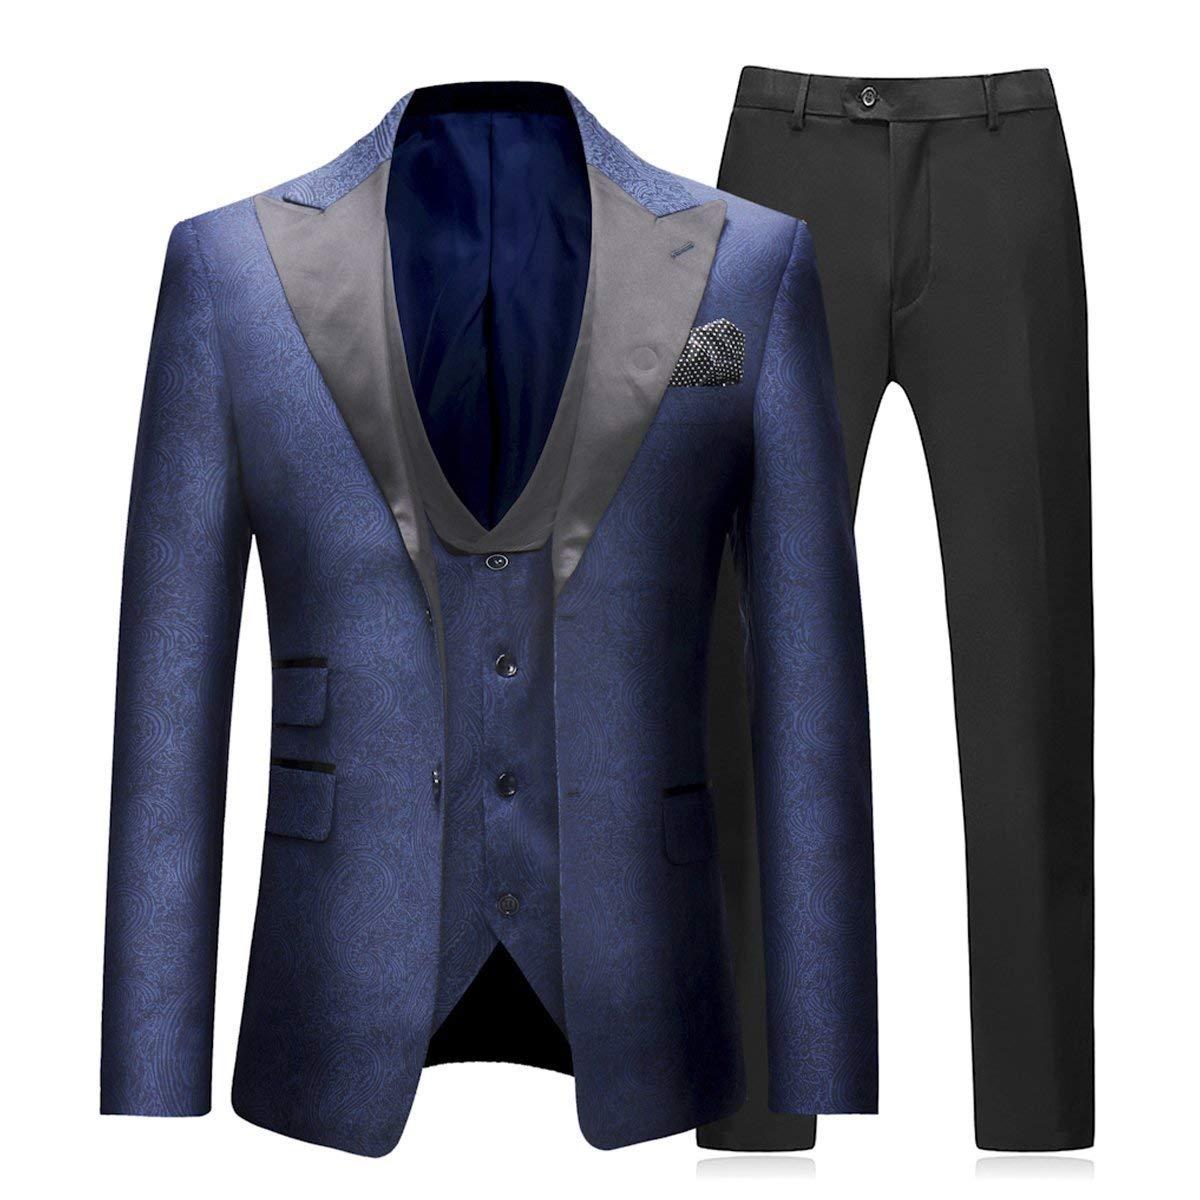 Boyland Mens 3 Piece Tuxedo Suits Jacquard Wedding Formal Wear Trouser by Boyland